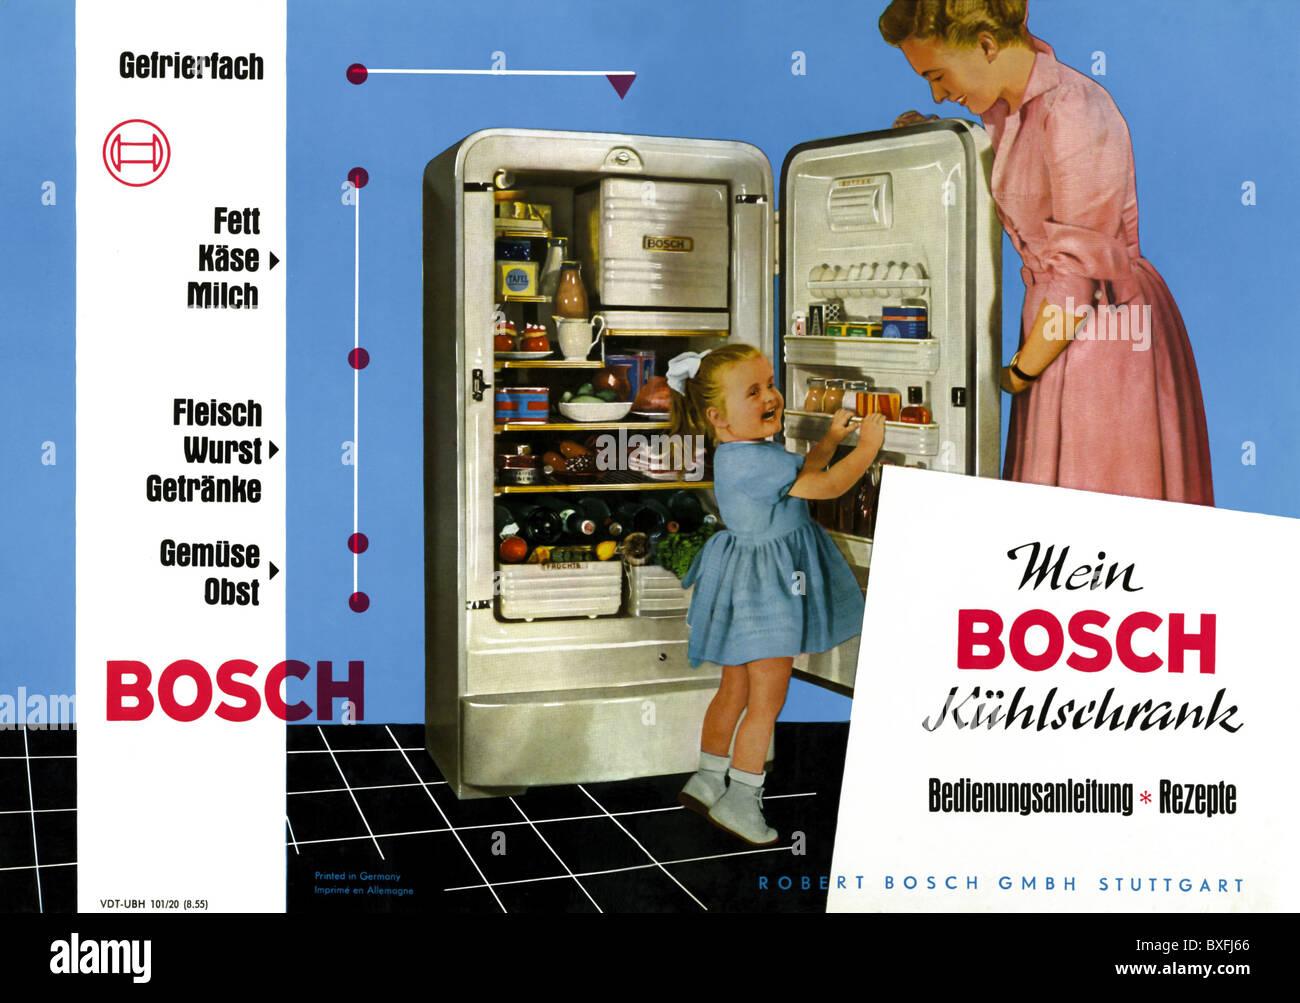 Bosch Kühlschrank Classic Edition Bedienungsanleitung : Bosch advertising stockfotos & bosch advertising bilder alamy